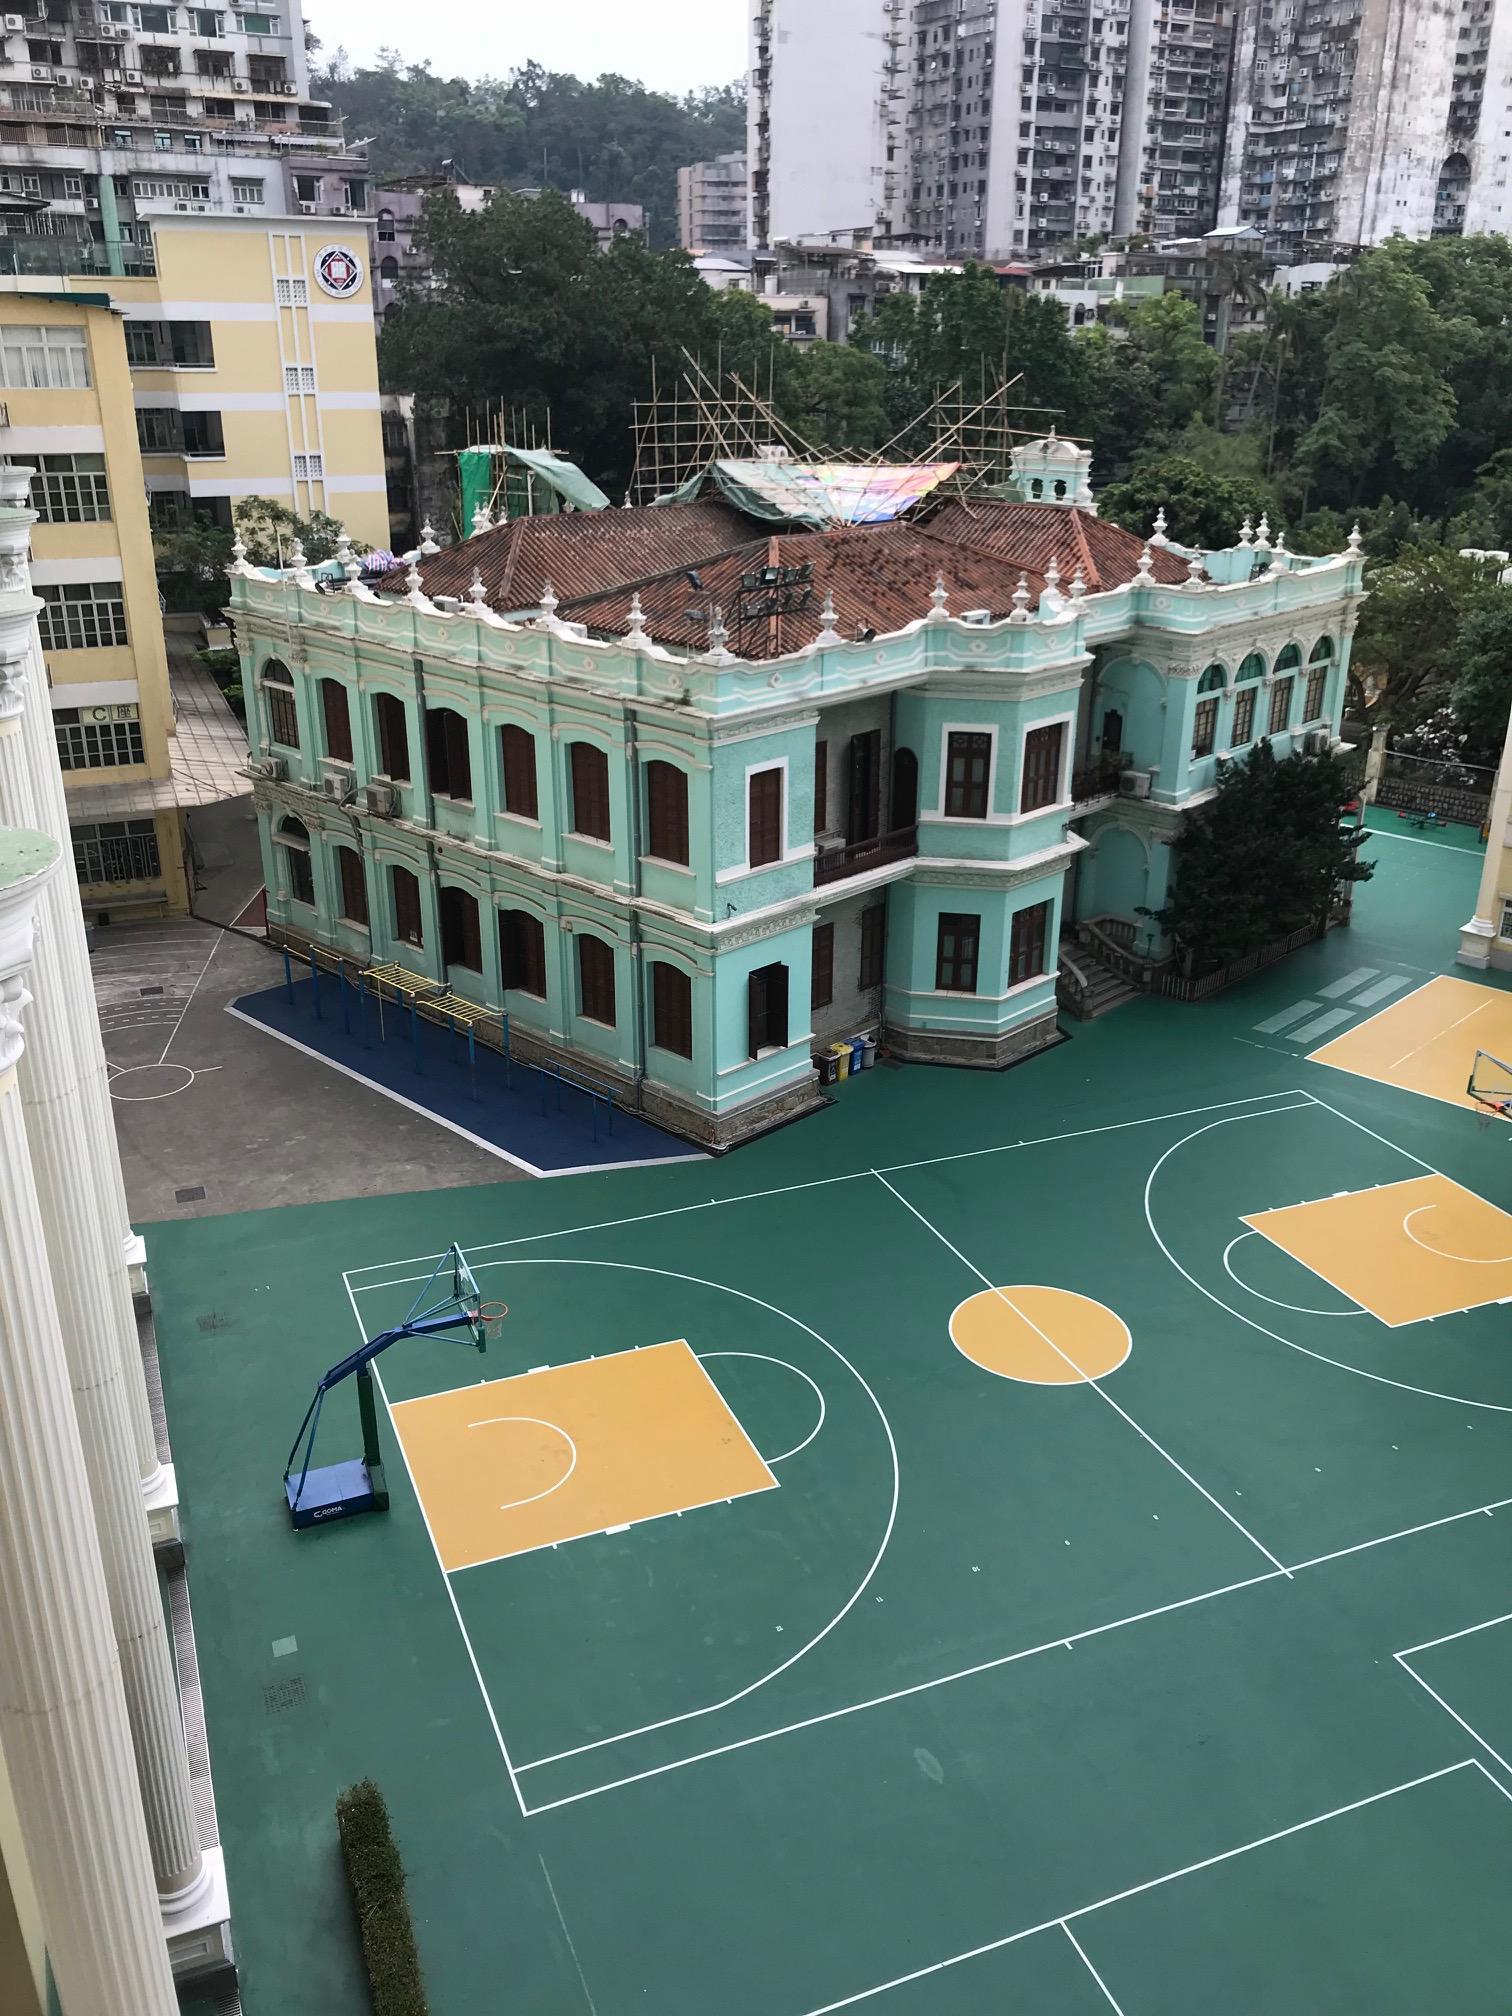 My home school.